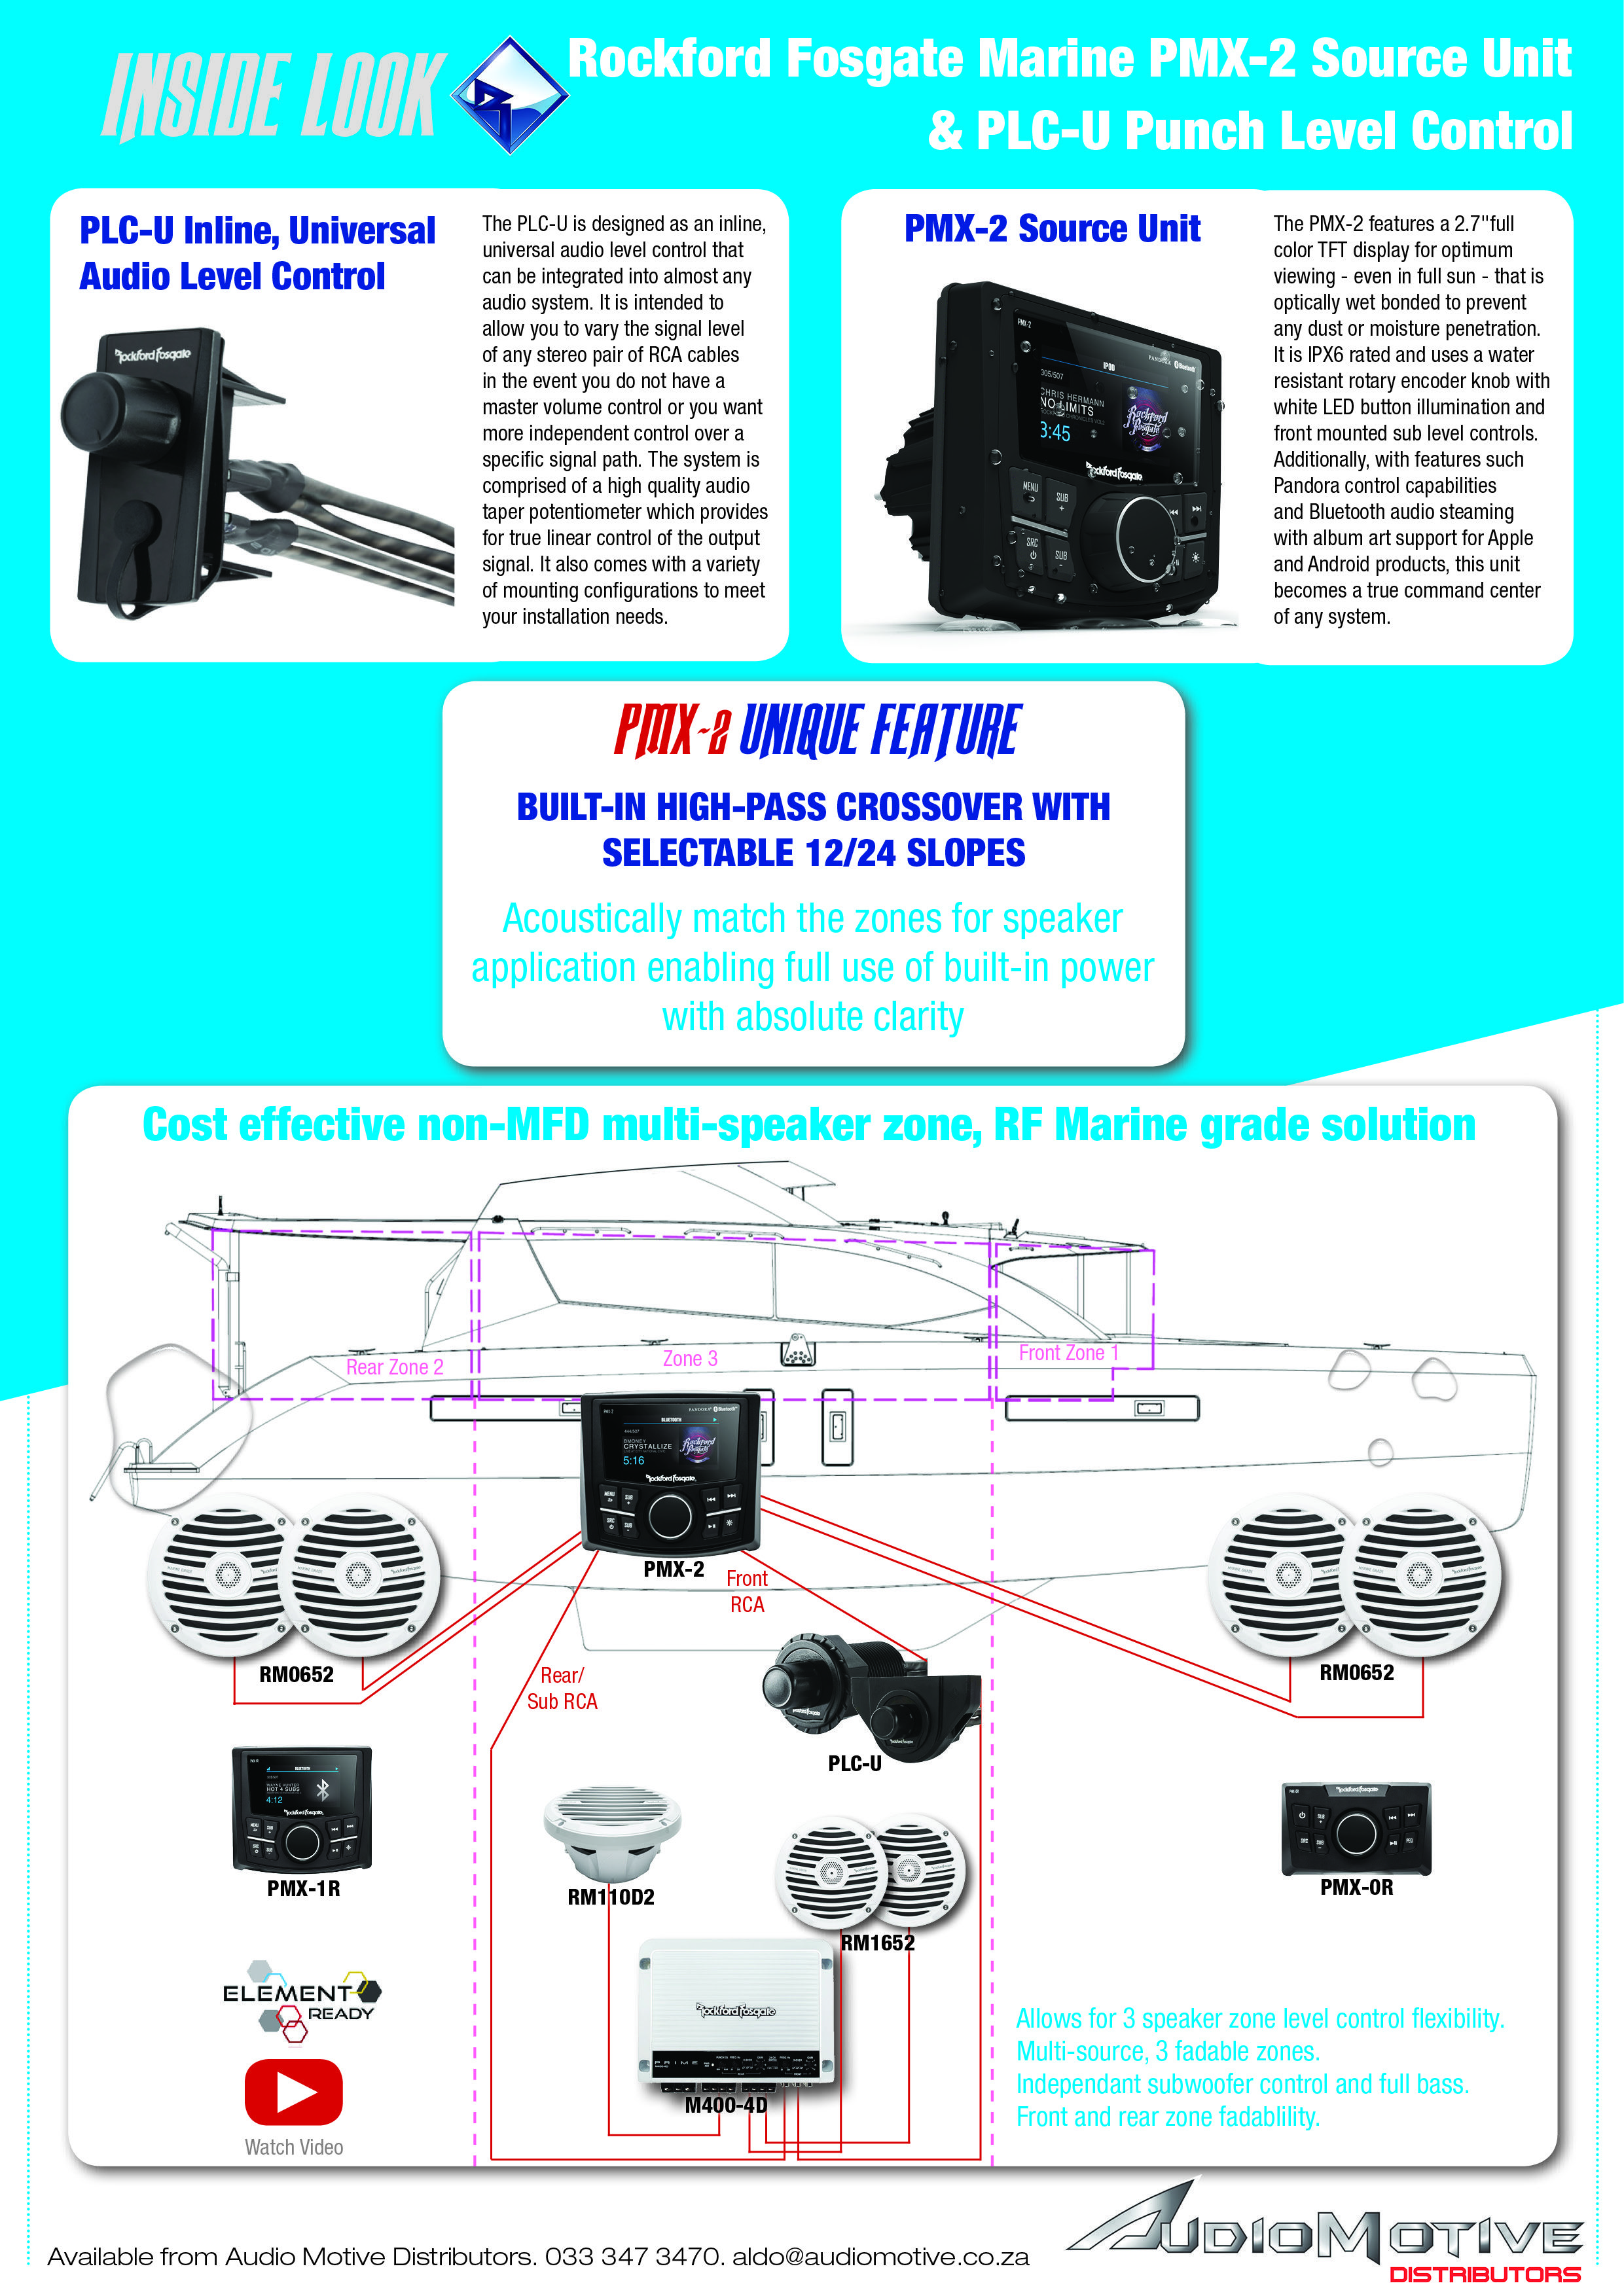 medium resolution of  marineaudio boataudio boatsound sourceunit soundforboat rockford fosgate boat sound system setup pmx 2